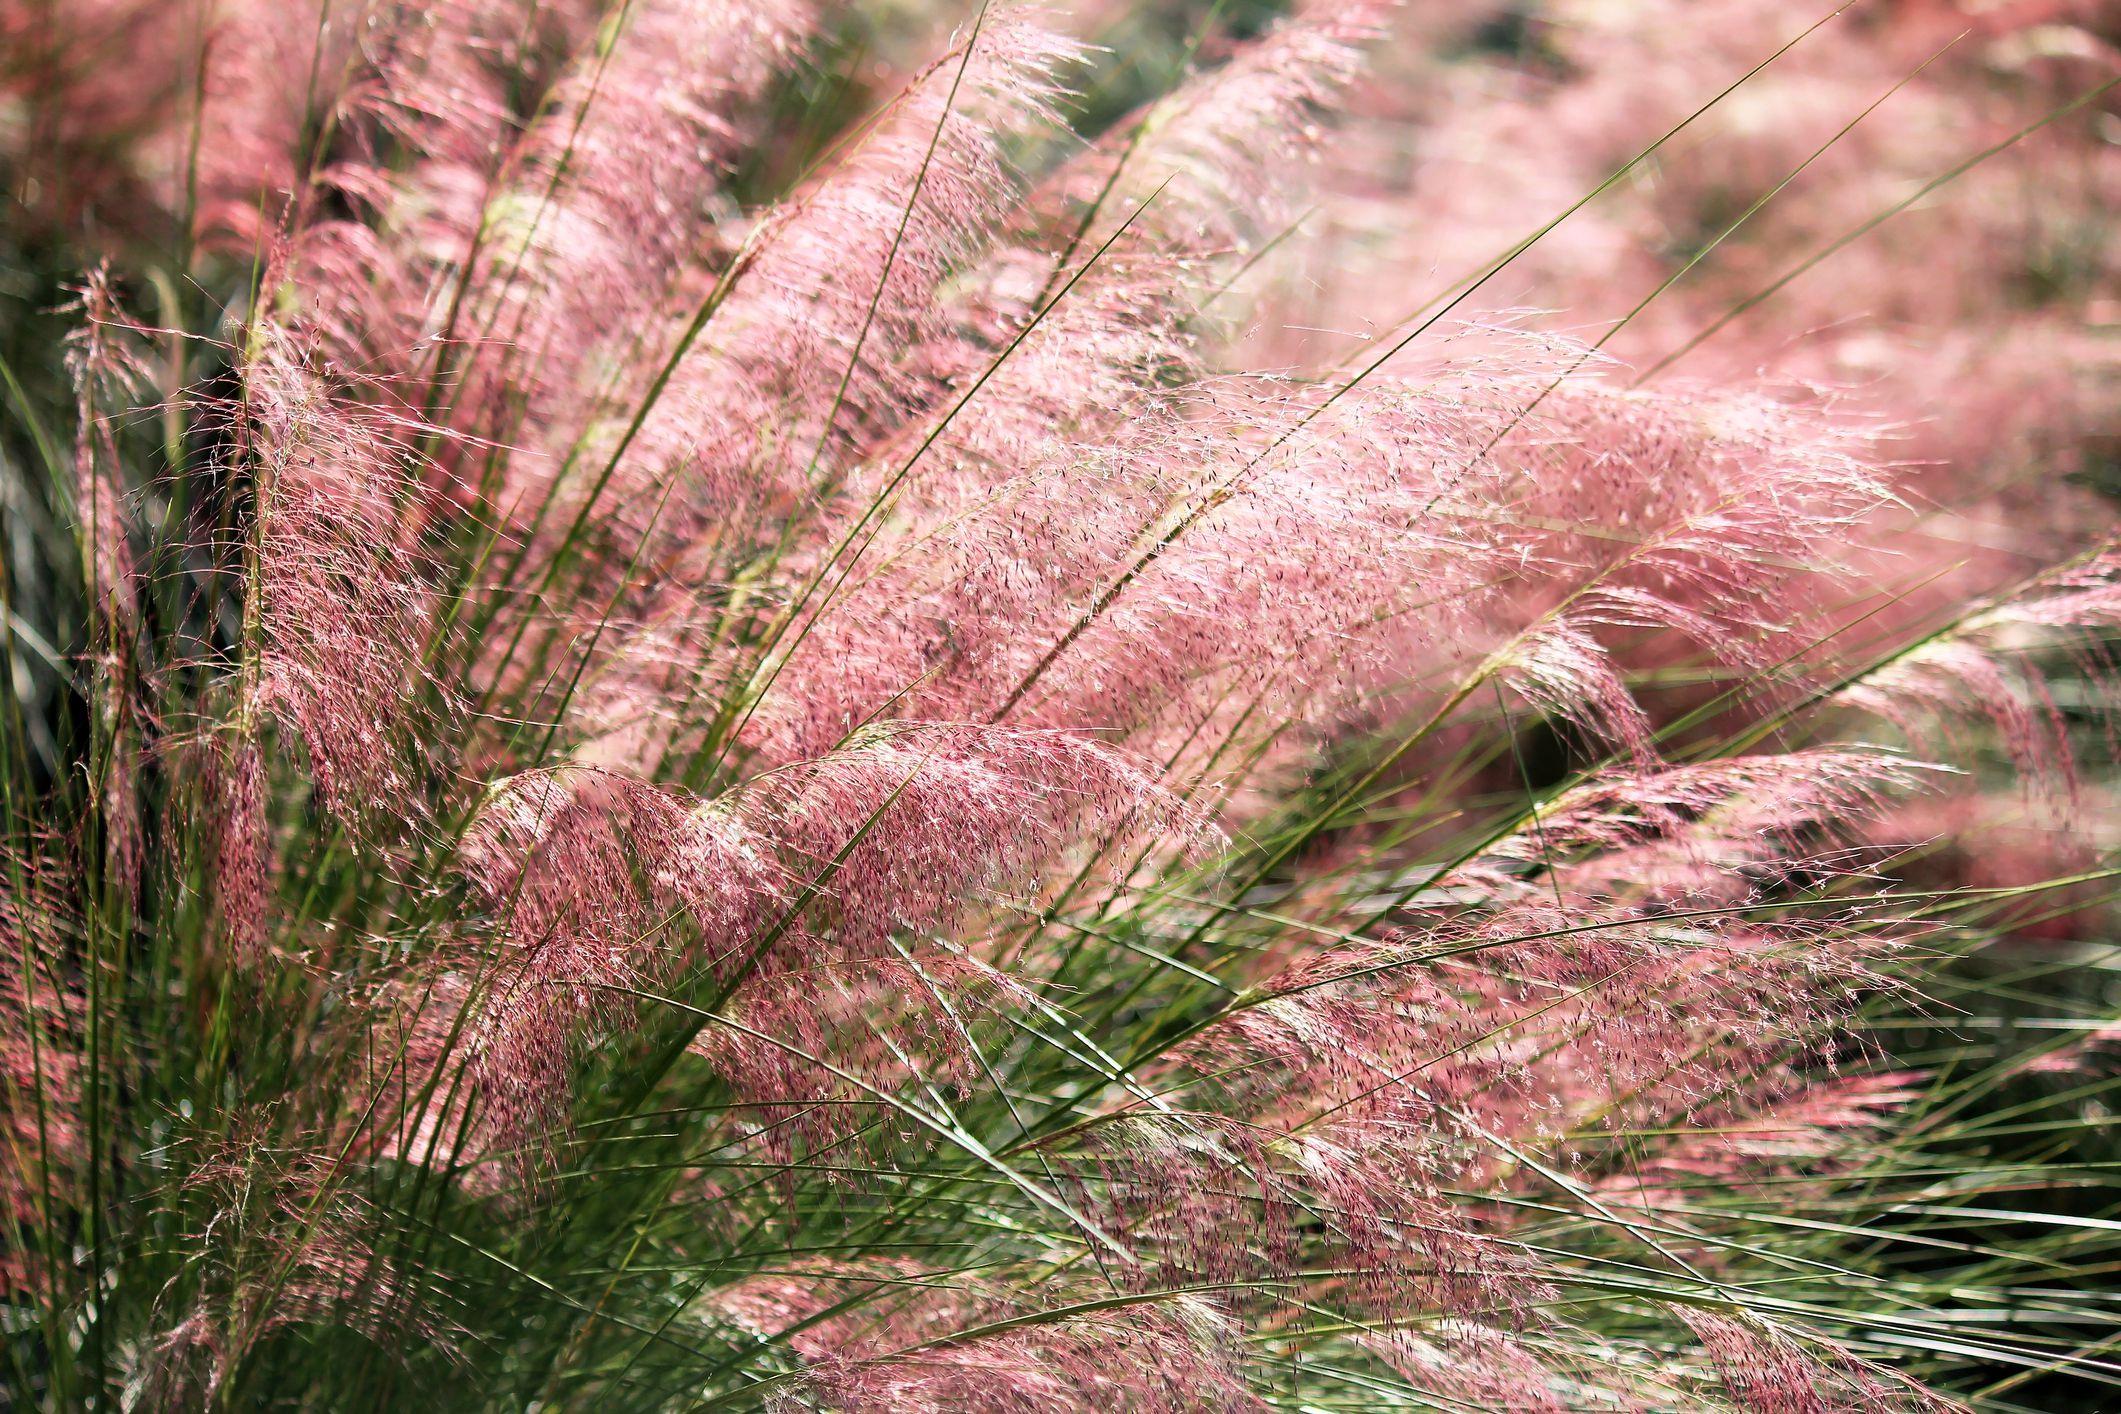 Best ornamental grasses for privacy mightylinksfo